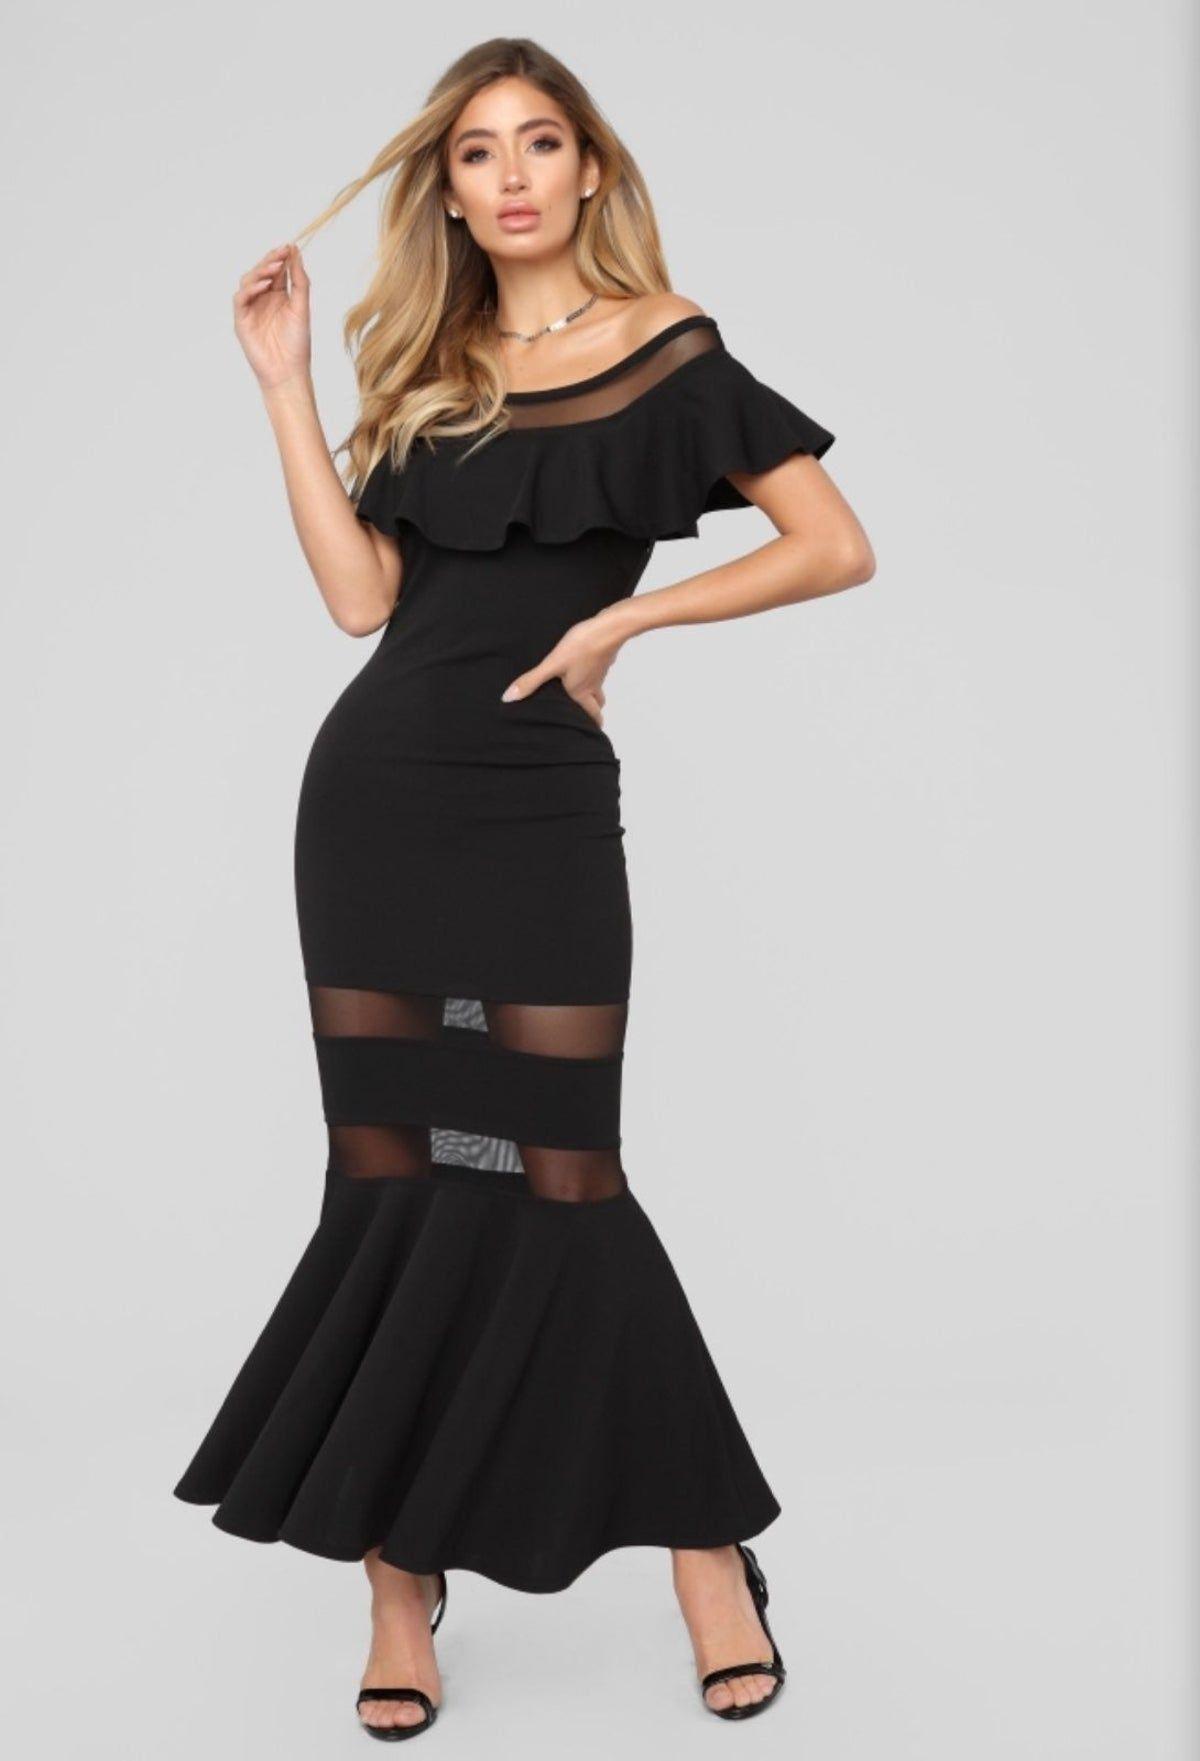 NEW Fashion Nova Roma Off Shoulder Dress Black off